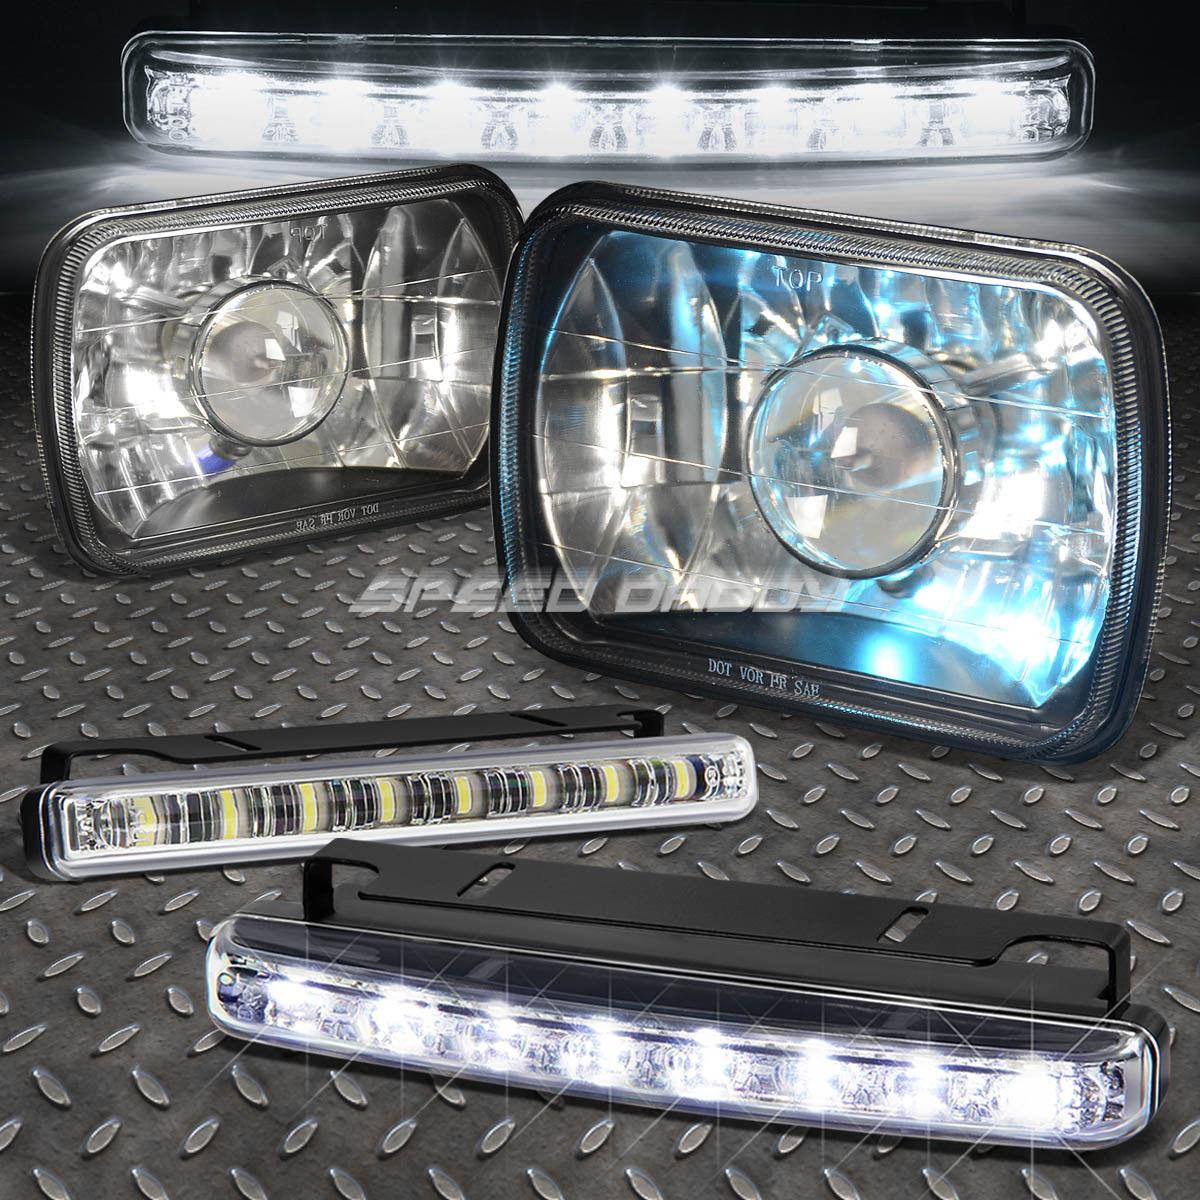 CHROME HEADLIGHT+AMBER CORNER+DRL+16 LED GRILL FOG LIGHT FIT 98-02 ACCORD CG